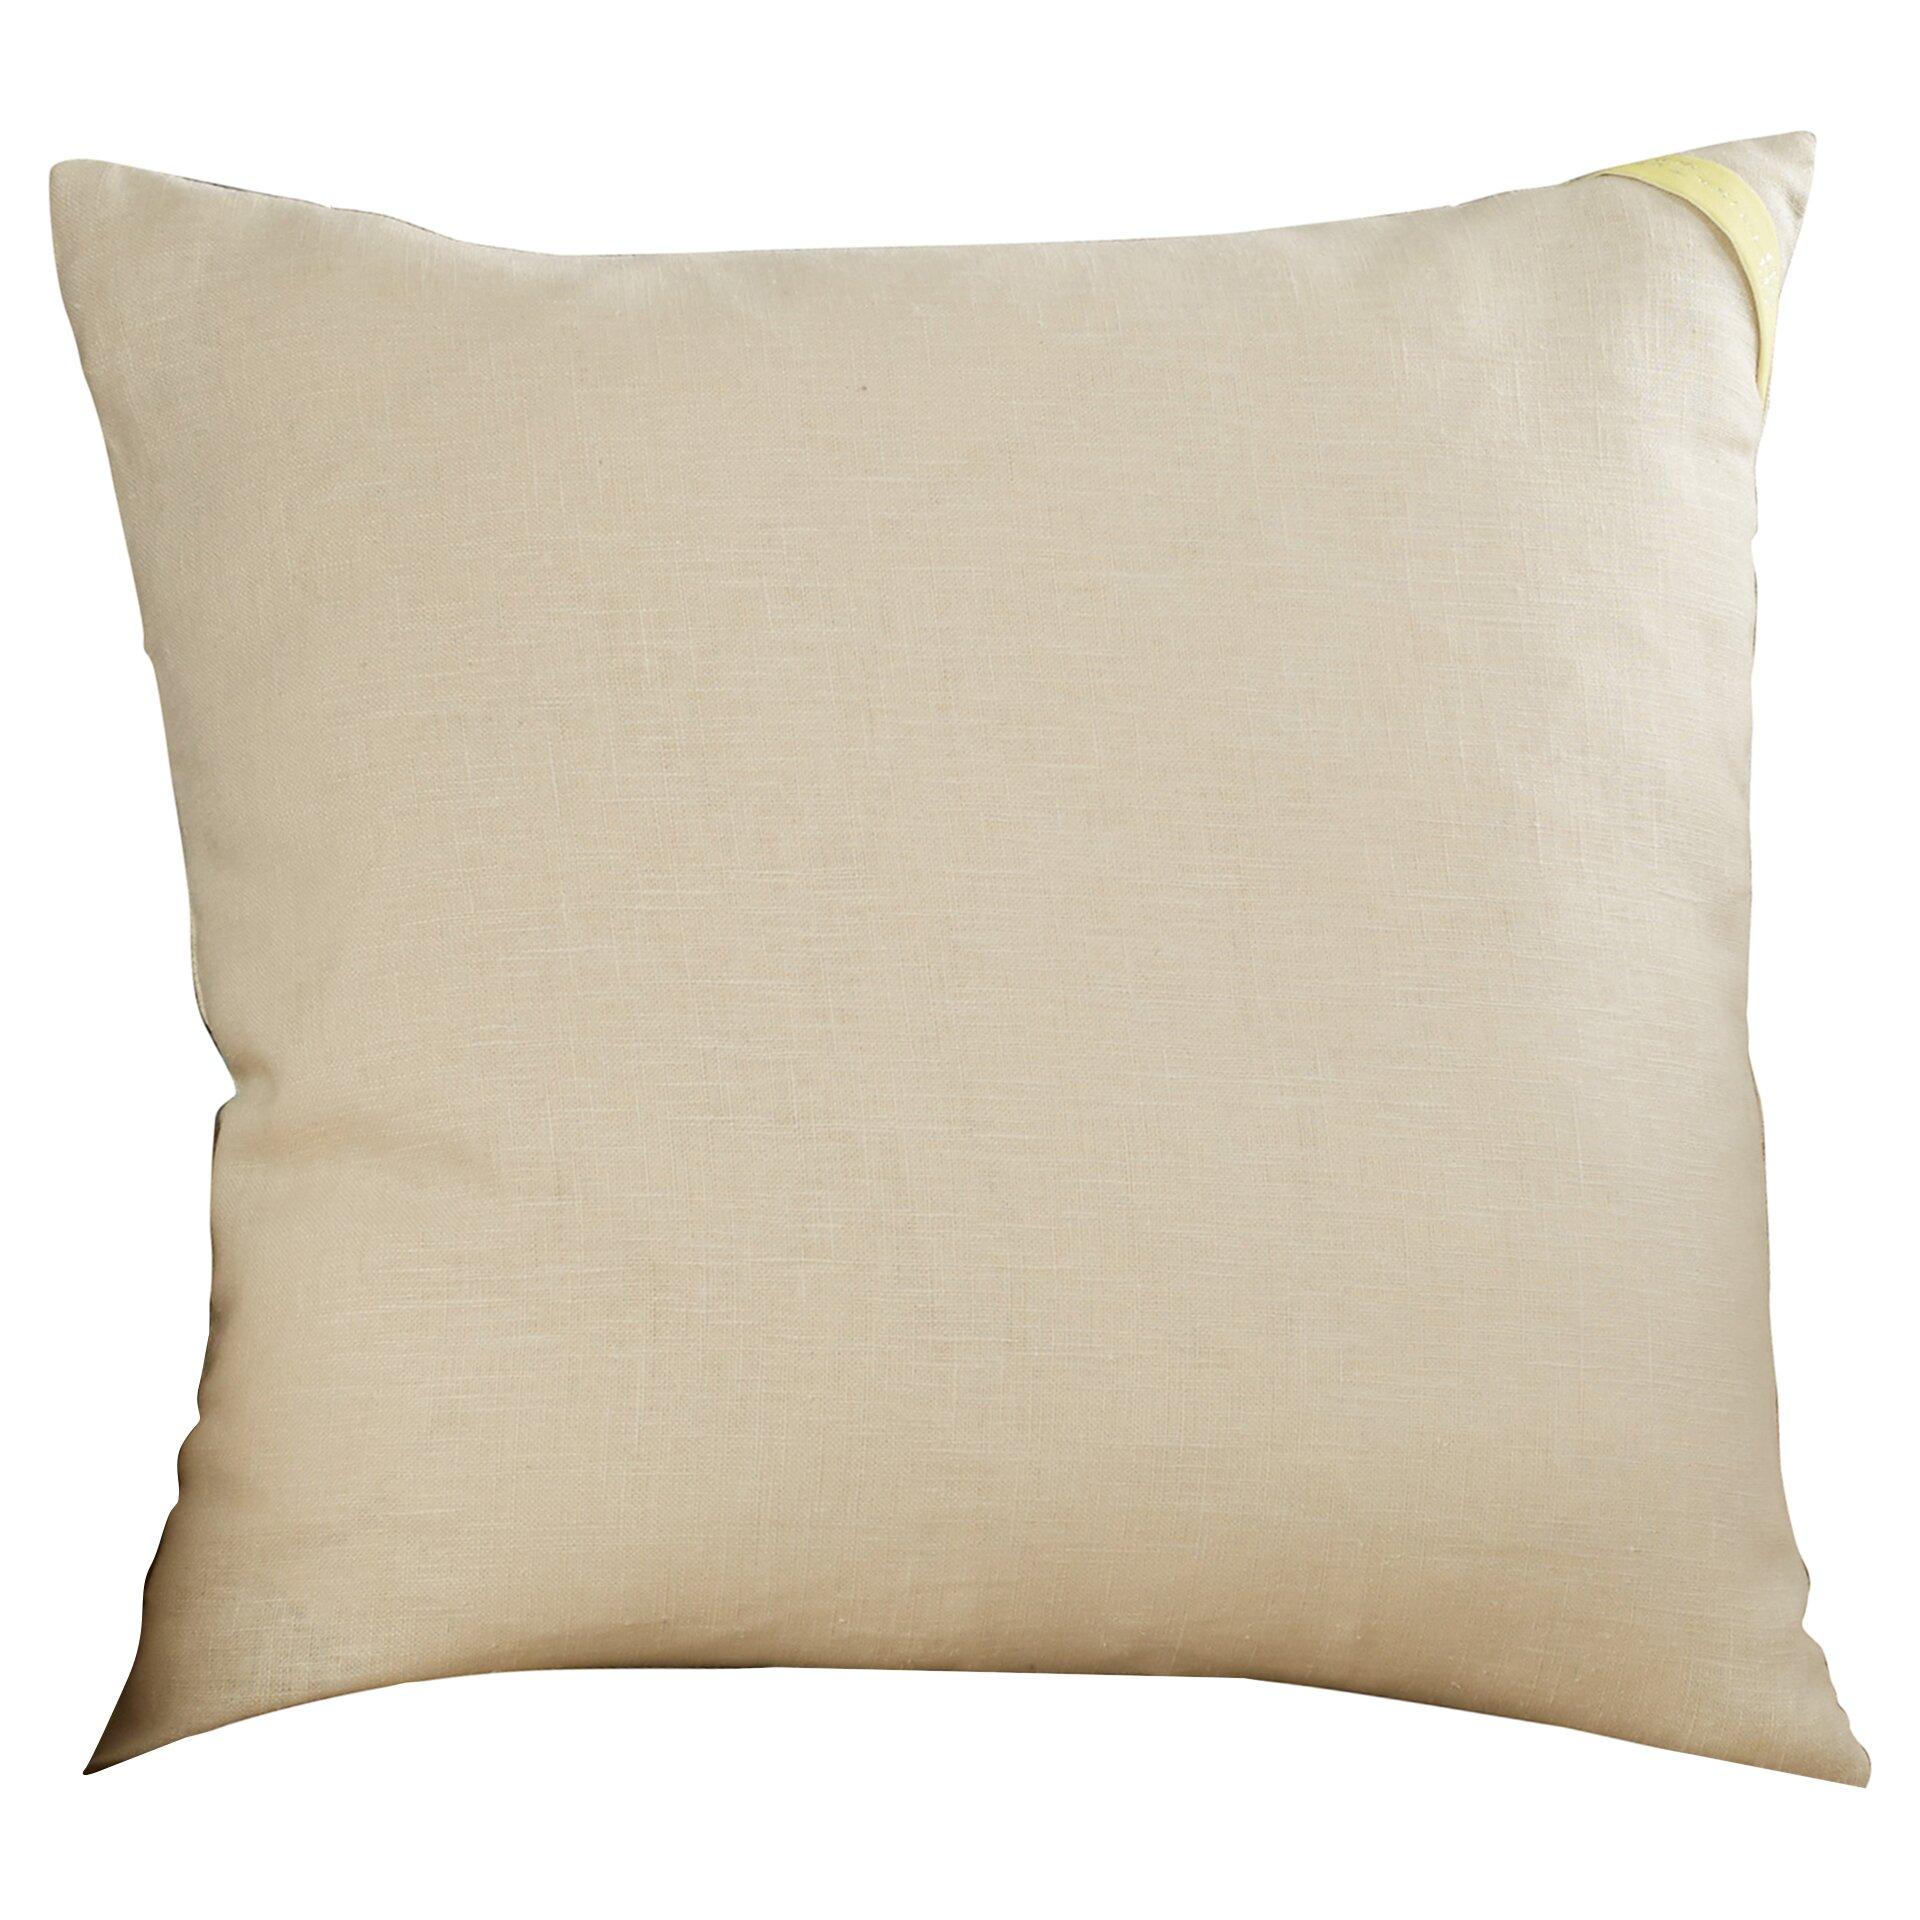 Decorative Pillows Trina Turk : Trina Turk Residential Waterflow Linen Throw Pillow & Reviews Wayfair